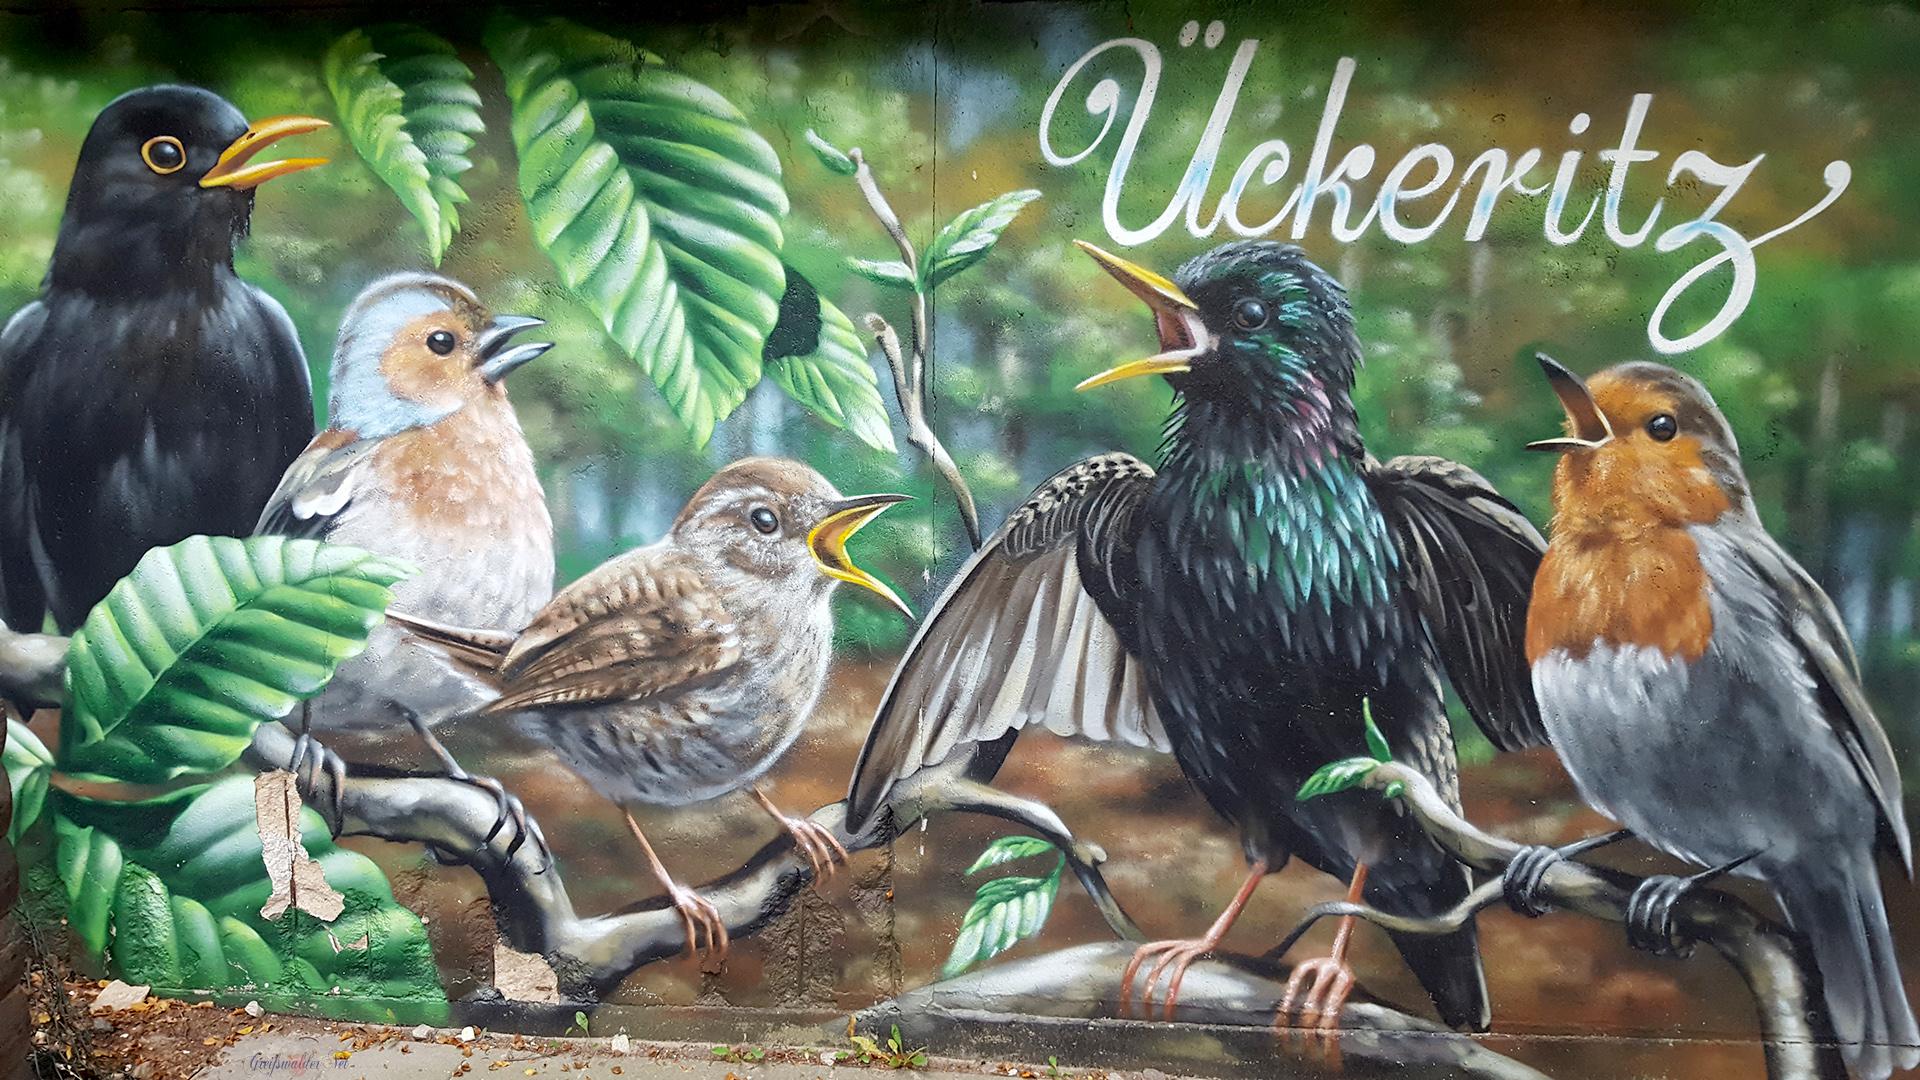 Graffiti in Ückeritz